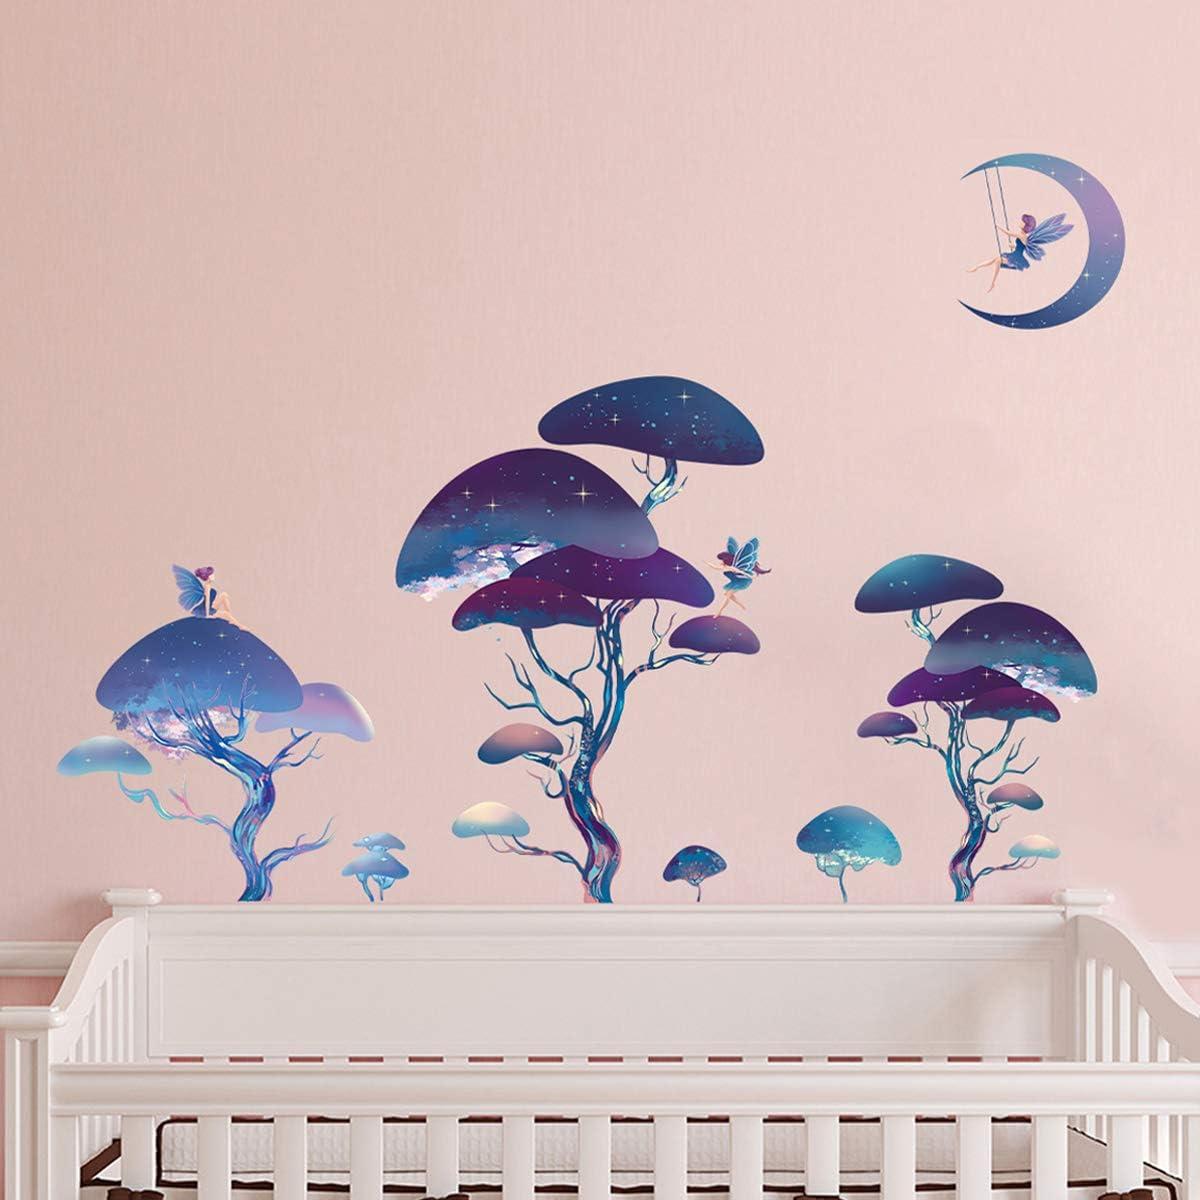 ufengke Dreamlike Forest Fairies Wall Stickers Stars Tree Wall Decals Art Decor for Girls Room Nursery Kids Bedroom